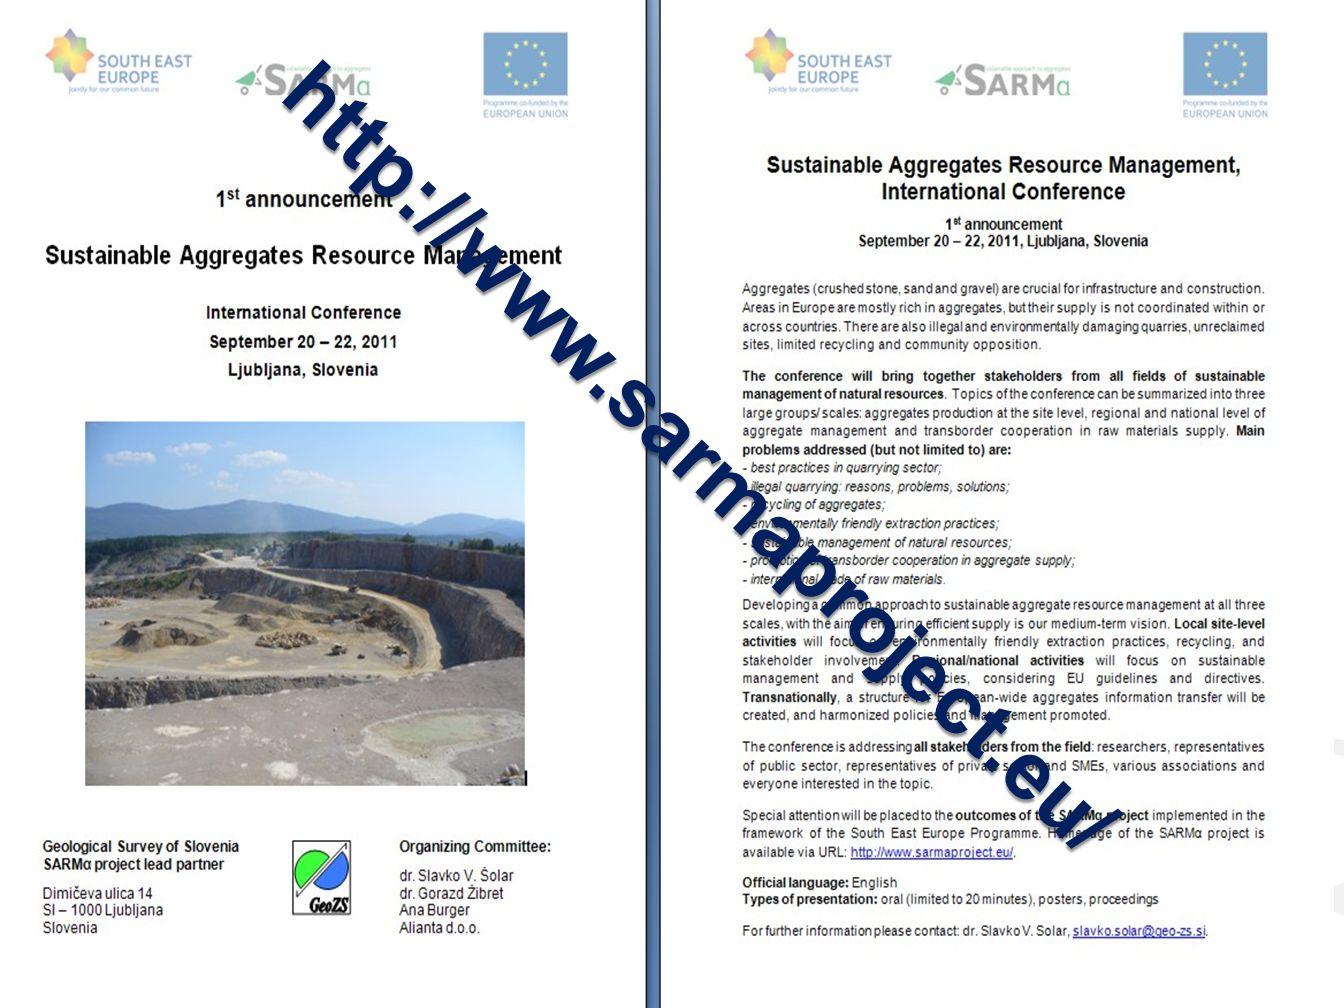 http://www.sarmaproject.eu/